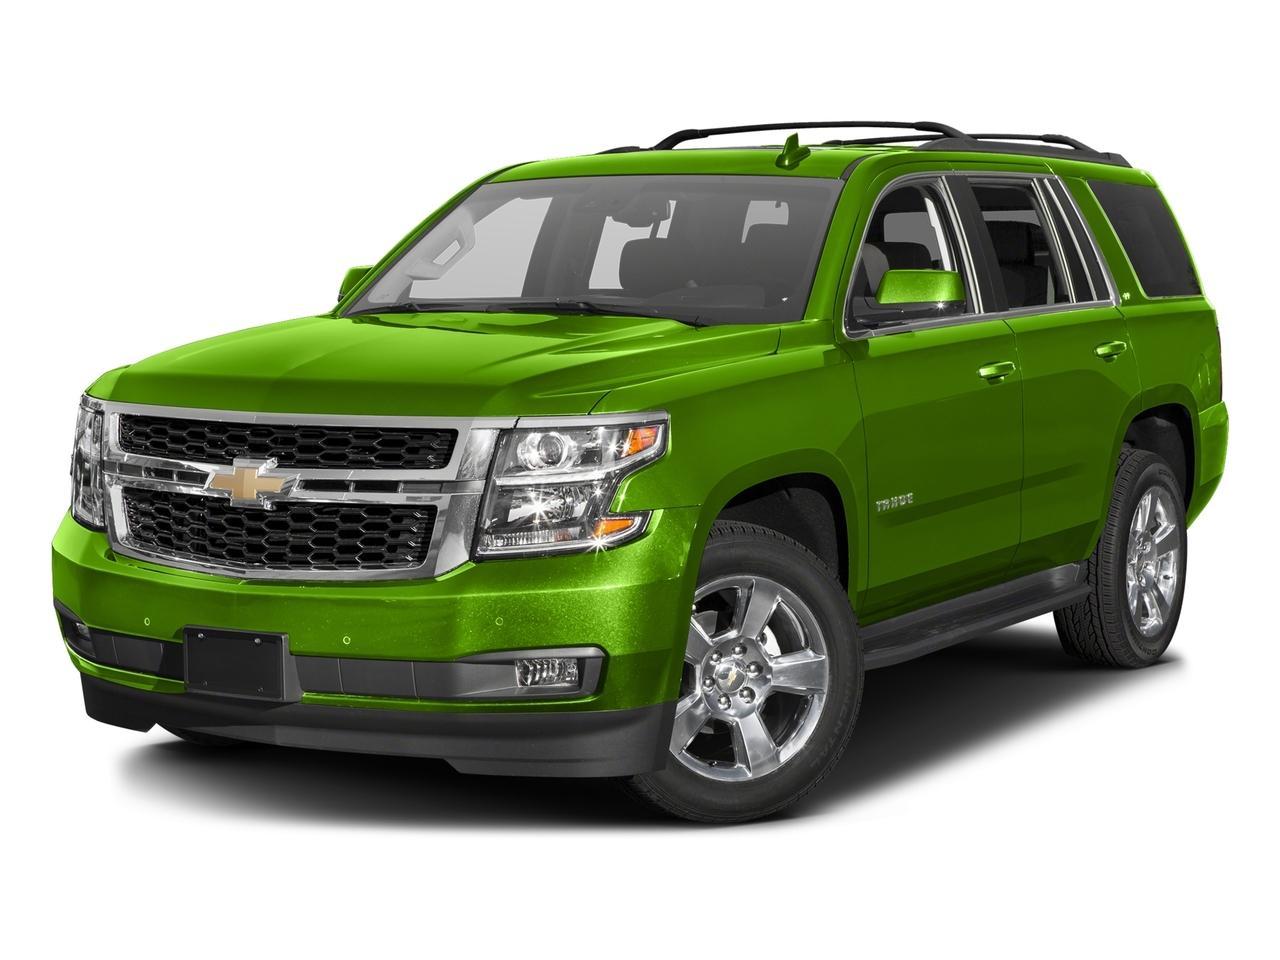 2016 Chevrolet Tahoe Vehicle Photo in Emporia, VA 23847